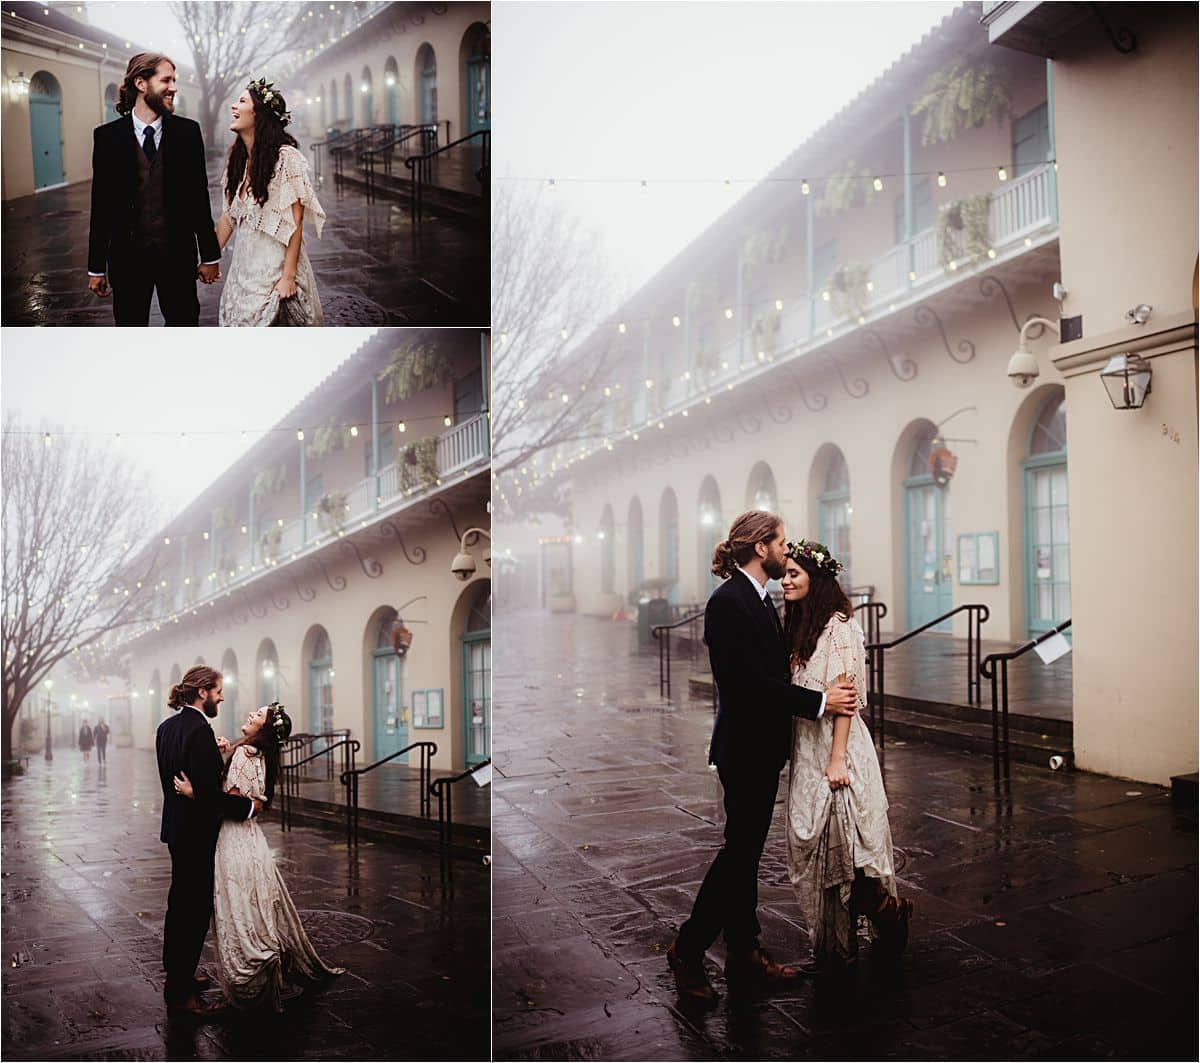 Rainy Day Stylized Wedding Bride and Groom on Street